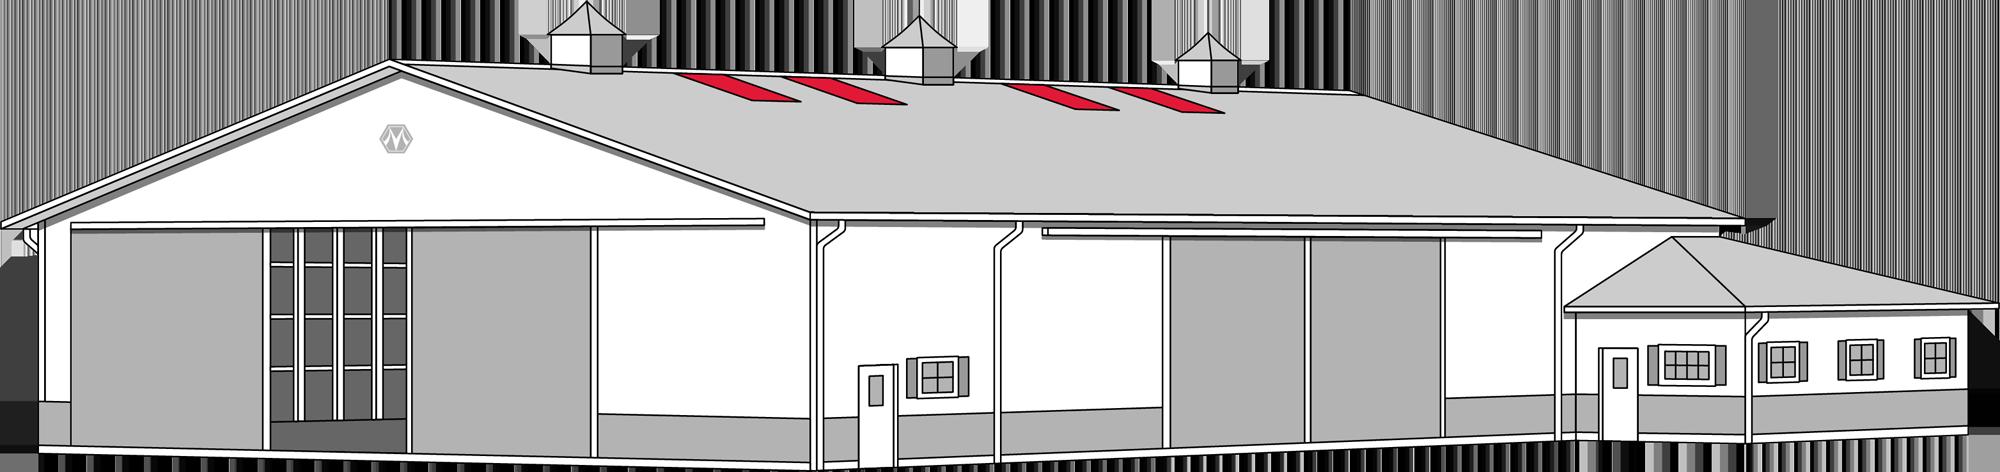 Repairs morton buildings skylight. Clipart barn pole barn